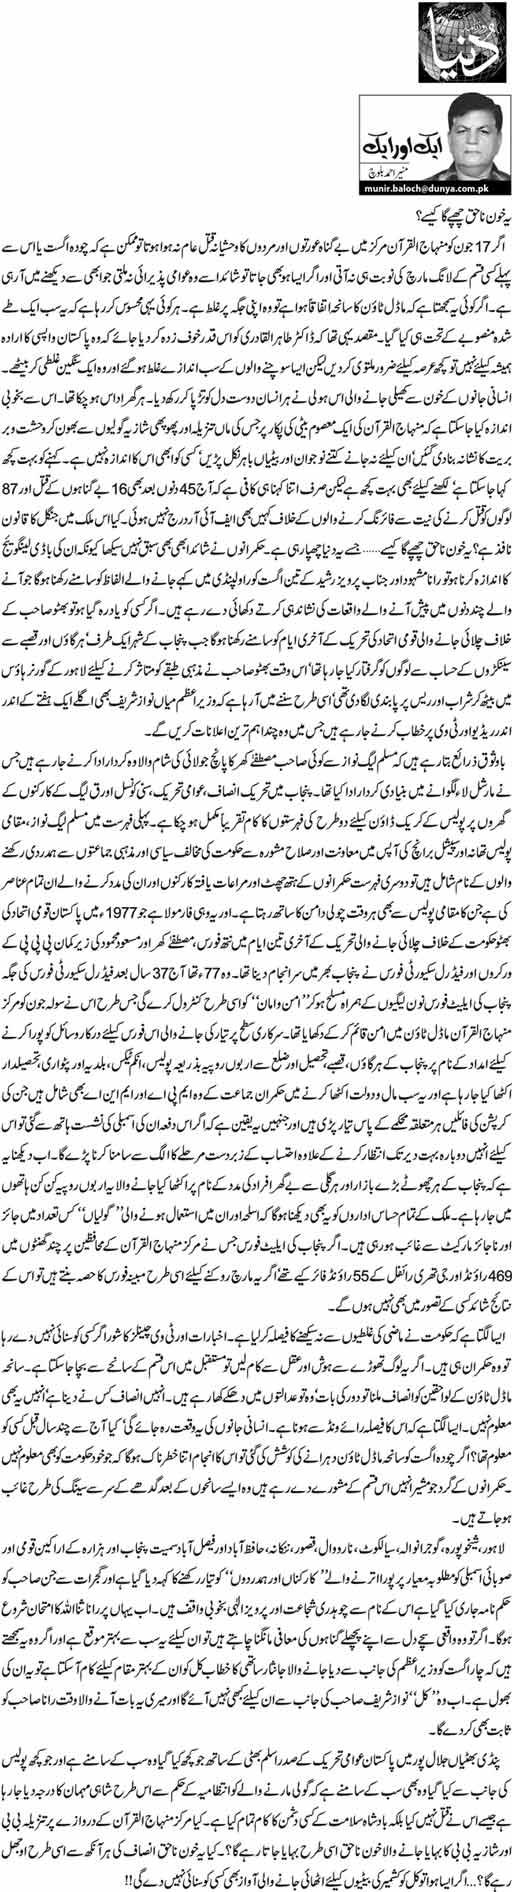 Yeh Khoon Nahaq Chupy Ga Kesy ? - Munir Ahmed Baloch